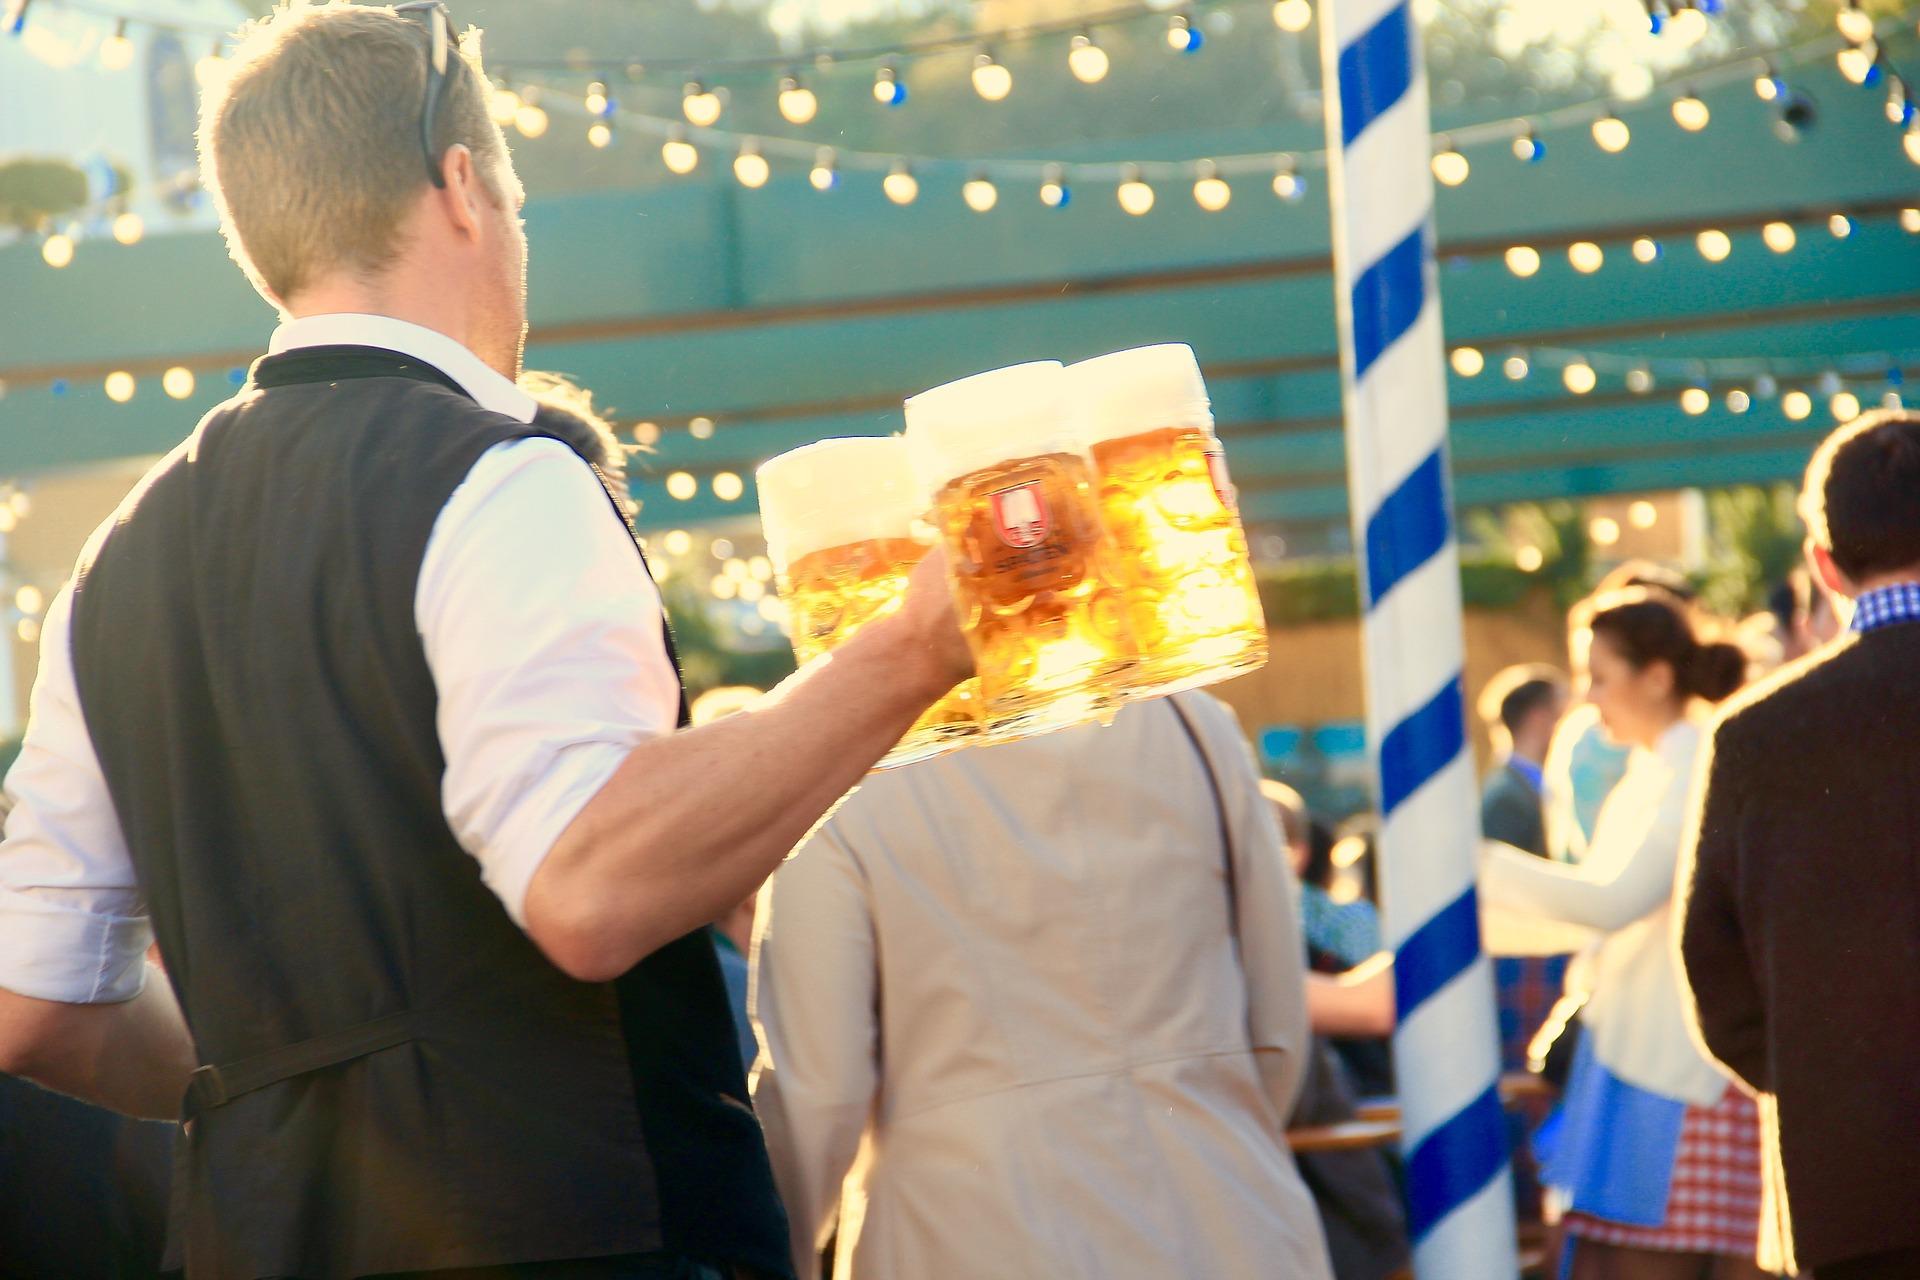 Oktoberfest Bierpreis sparen